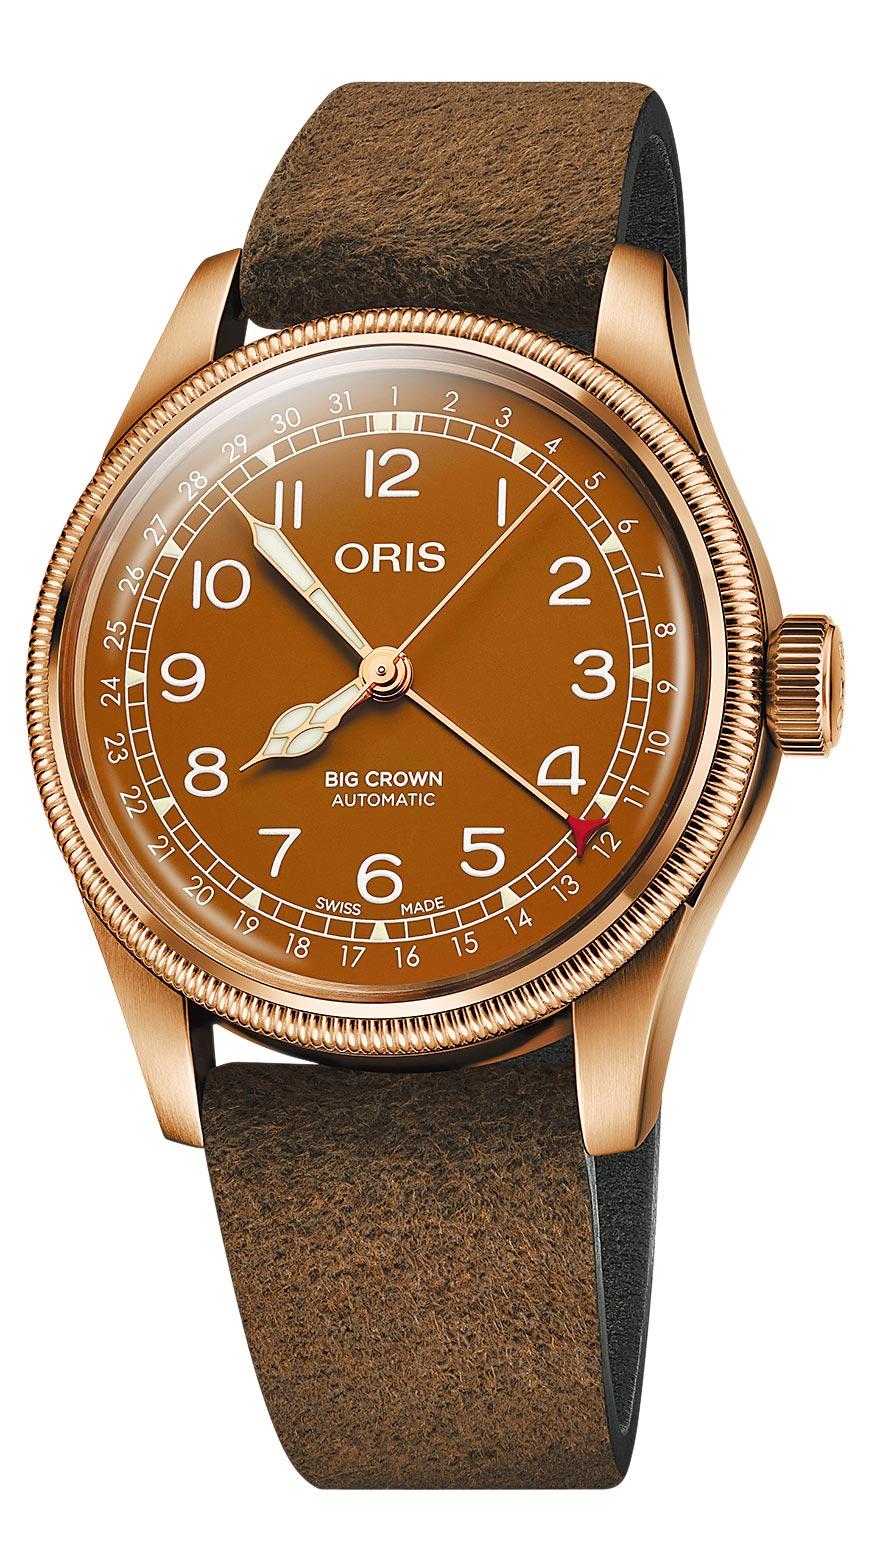 ORIS Big Crown指針式日期青銅表,6萬元。(ORIS提供)